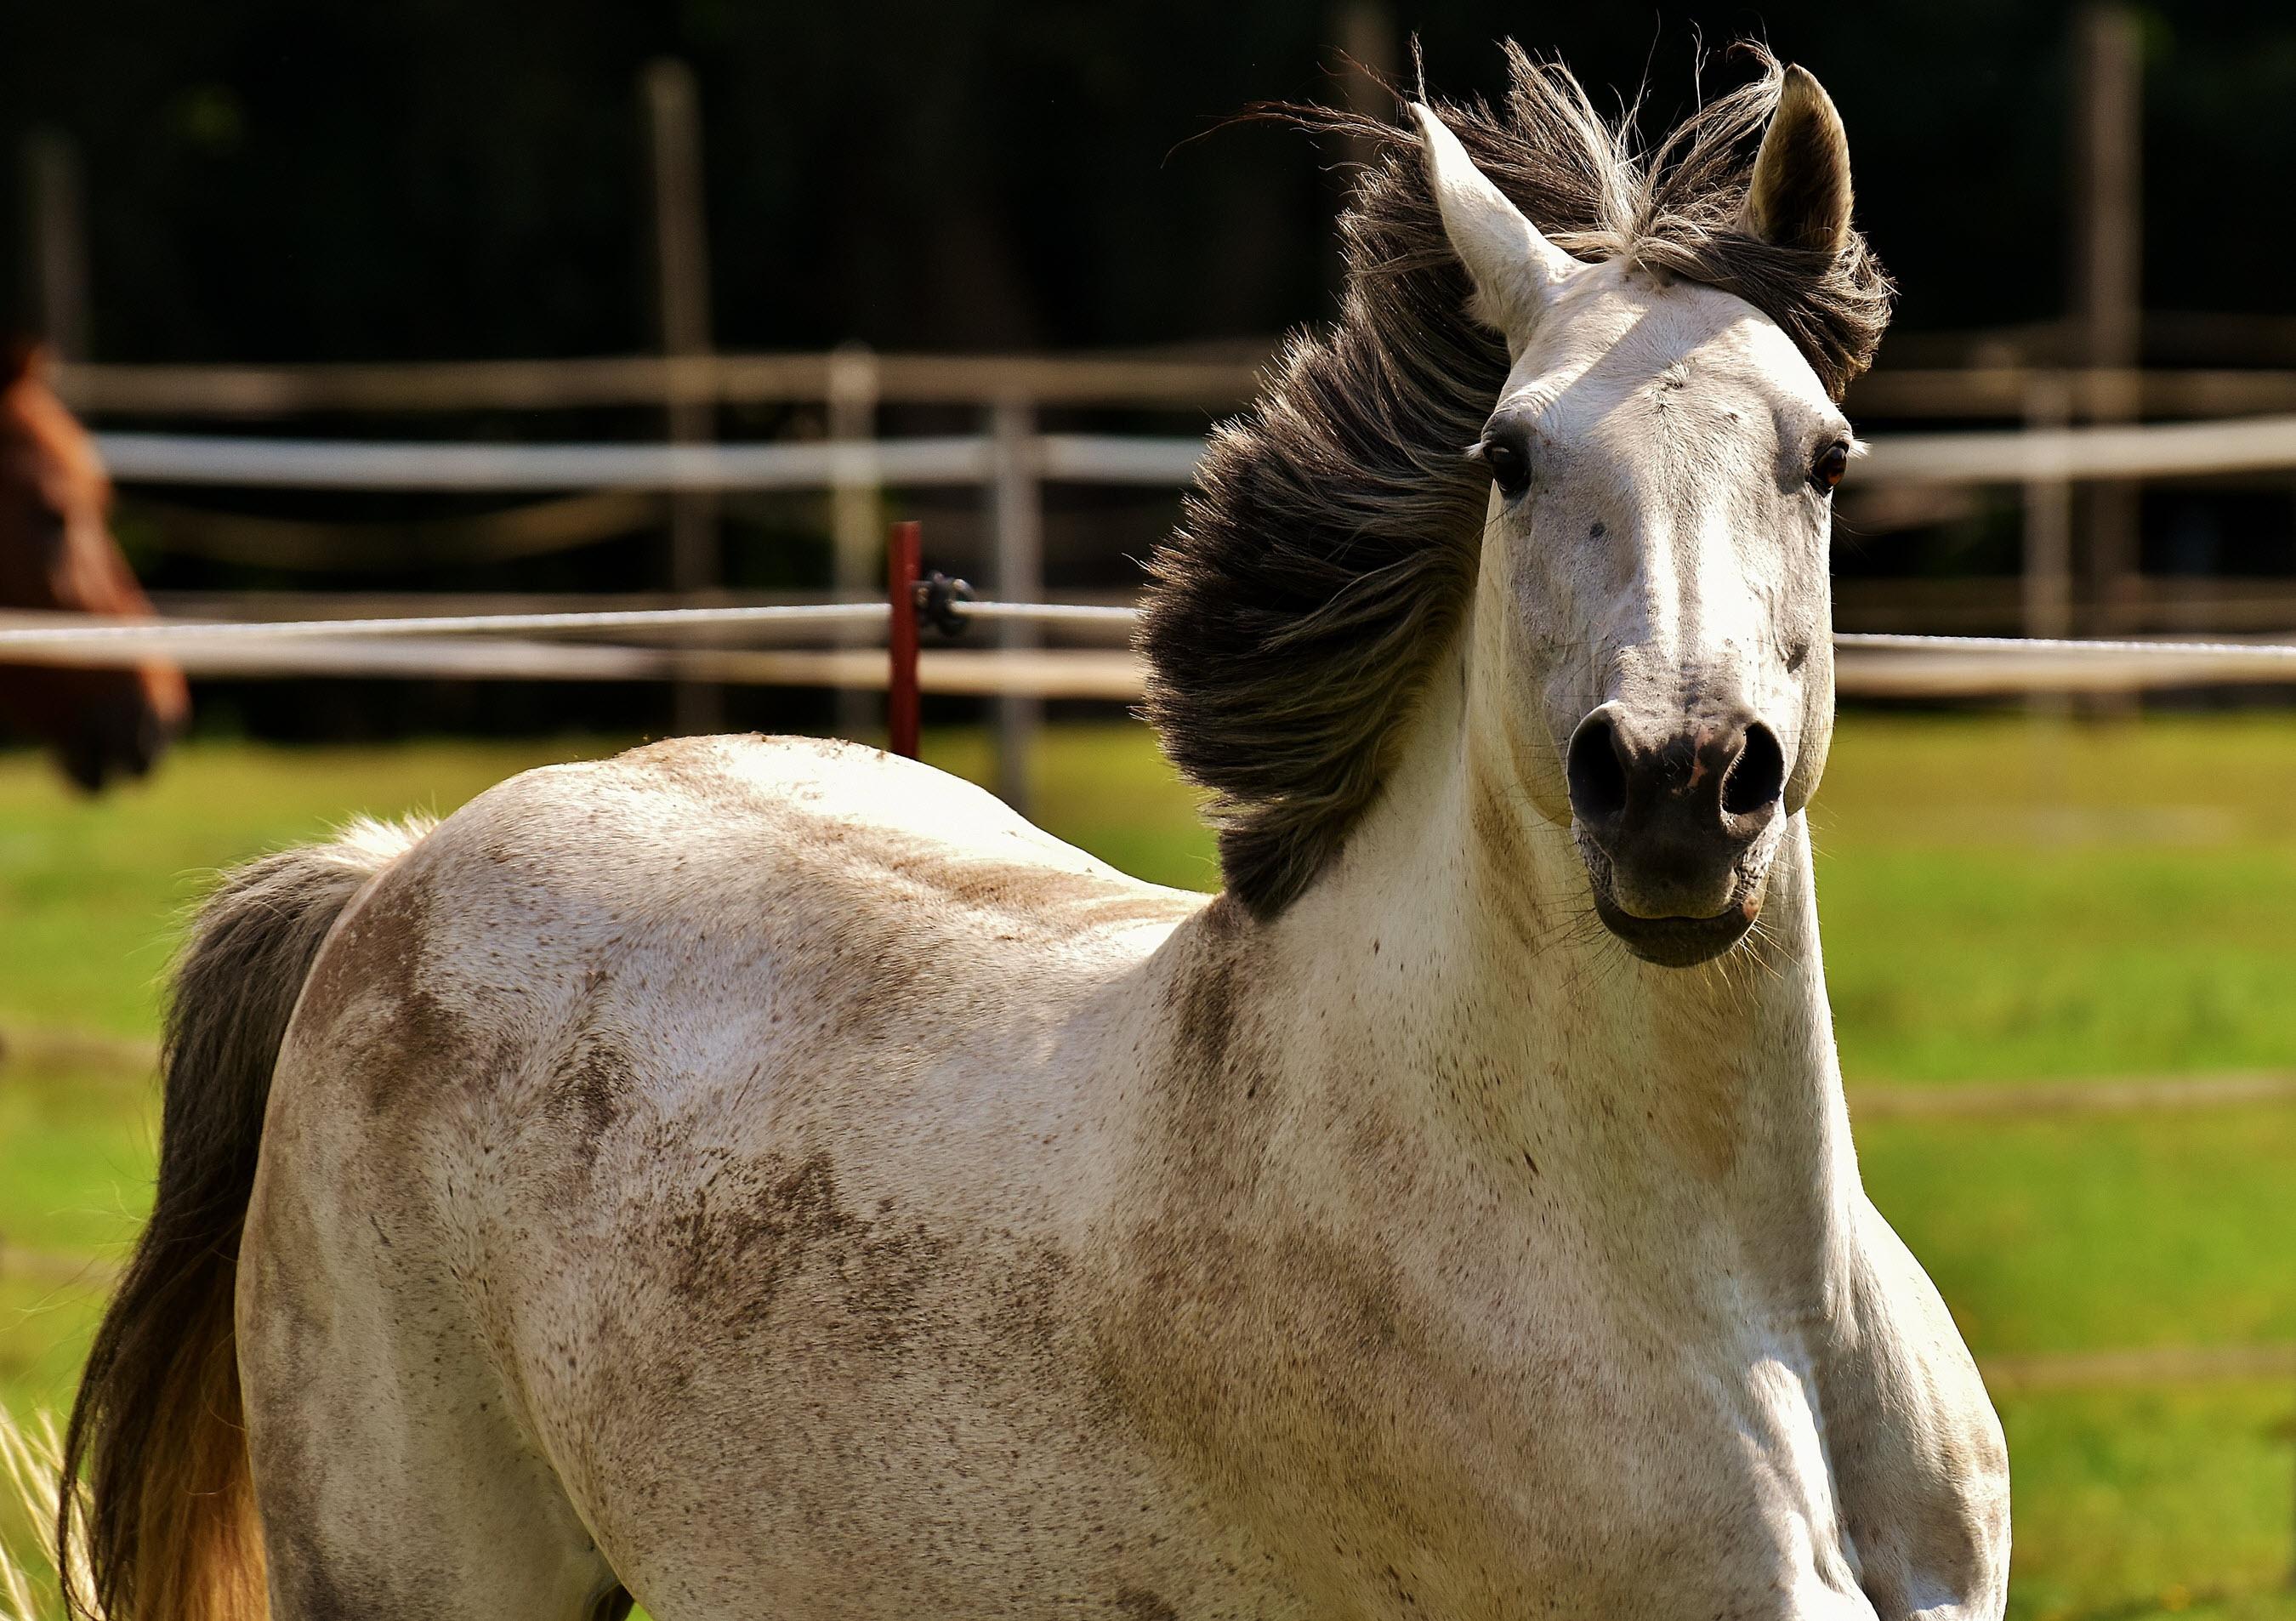 red Horse back facing dreamstime